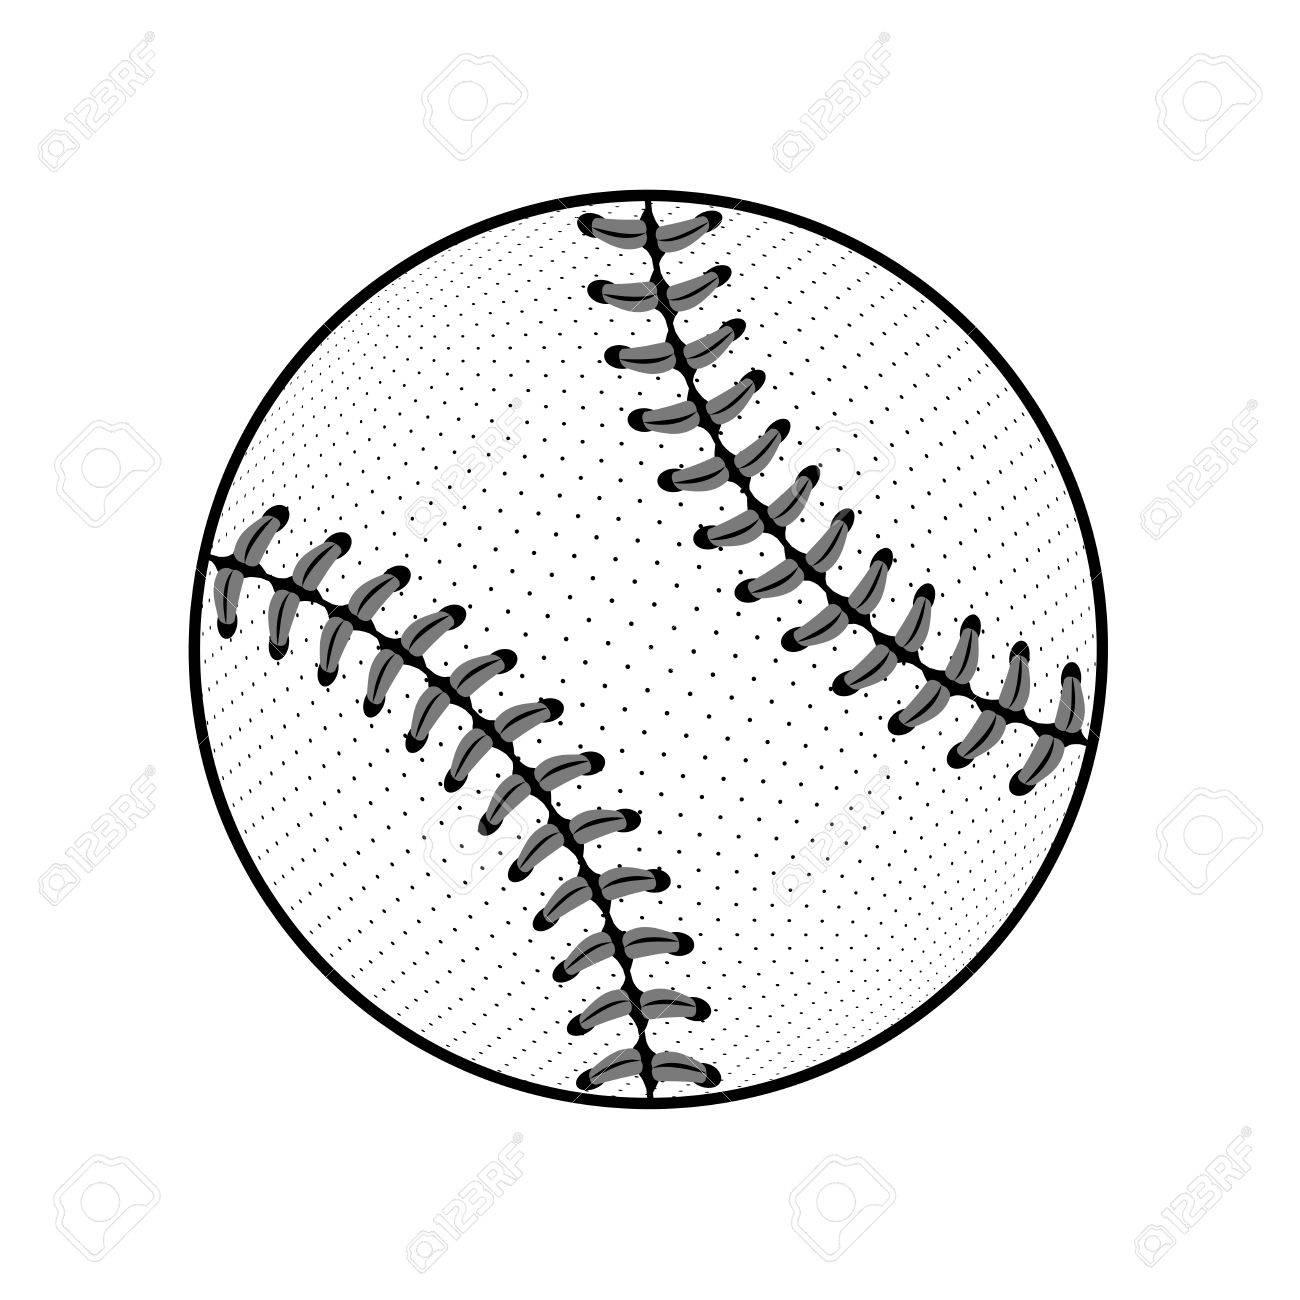 1300x1300 Baseball Ball Sign. Black Softball Icon Isolated On White